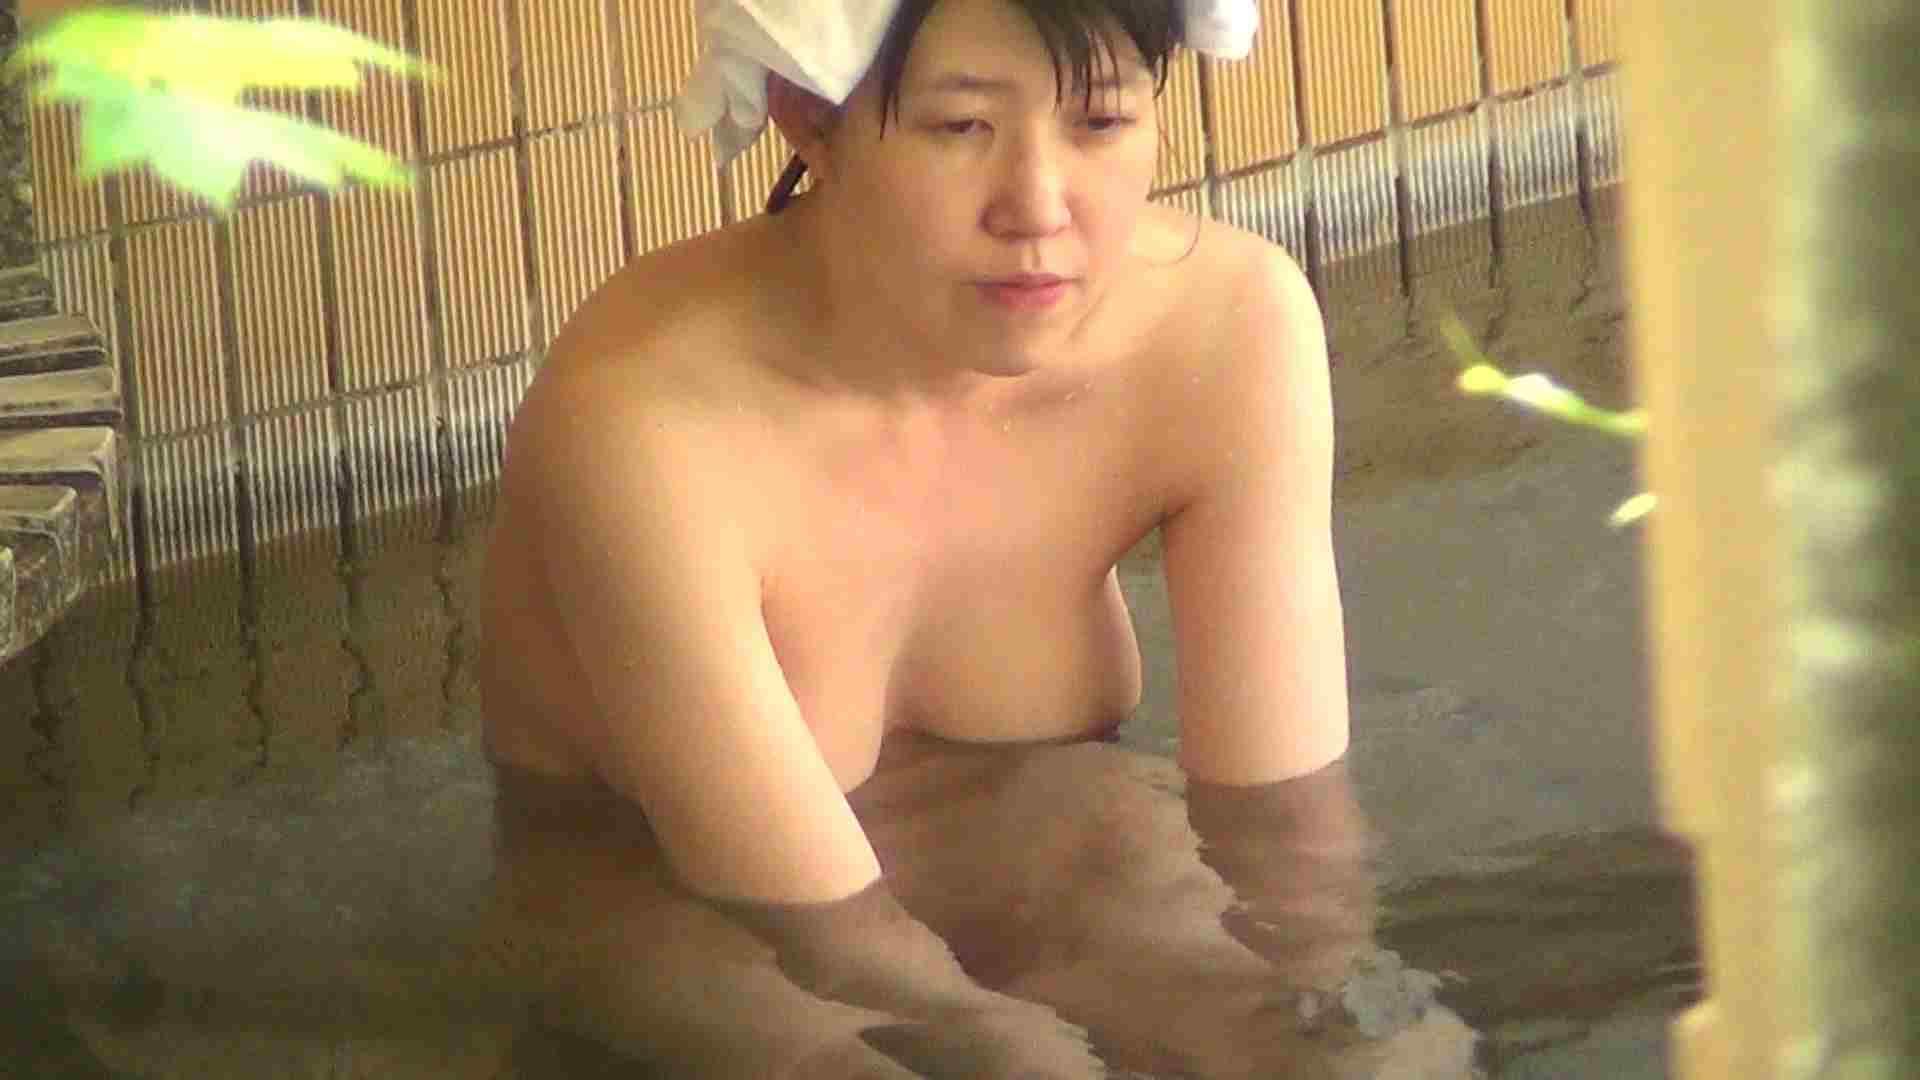 Aquaな露天風呂Vol.248 露天風呂編 | 盗撮シリーズ  97PIX 15